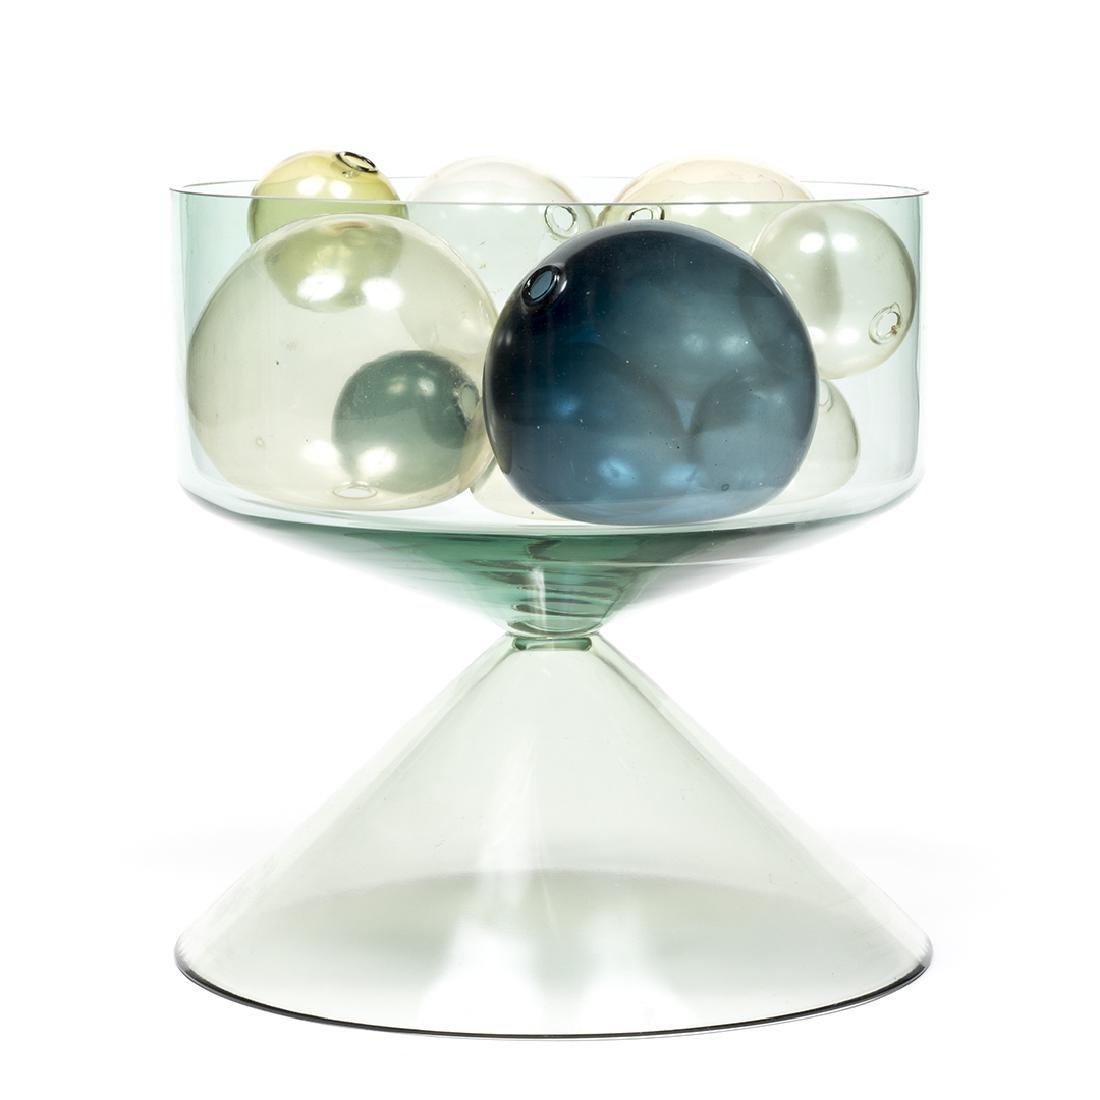 Timo Sarpaneva Style Vase With Glass Balls